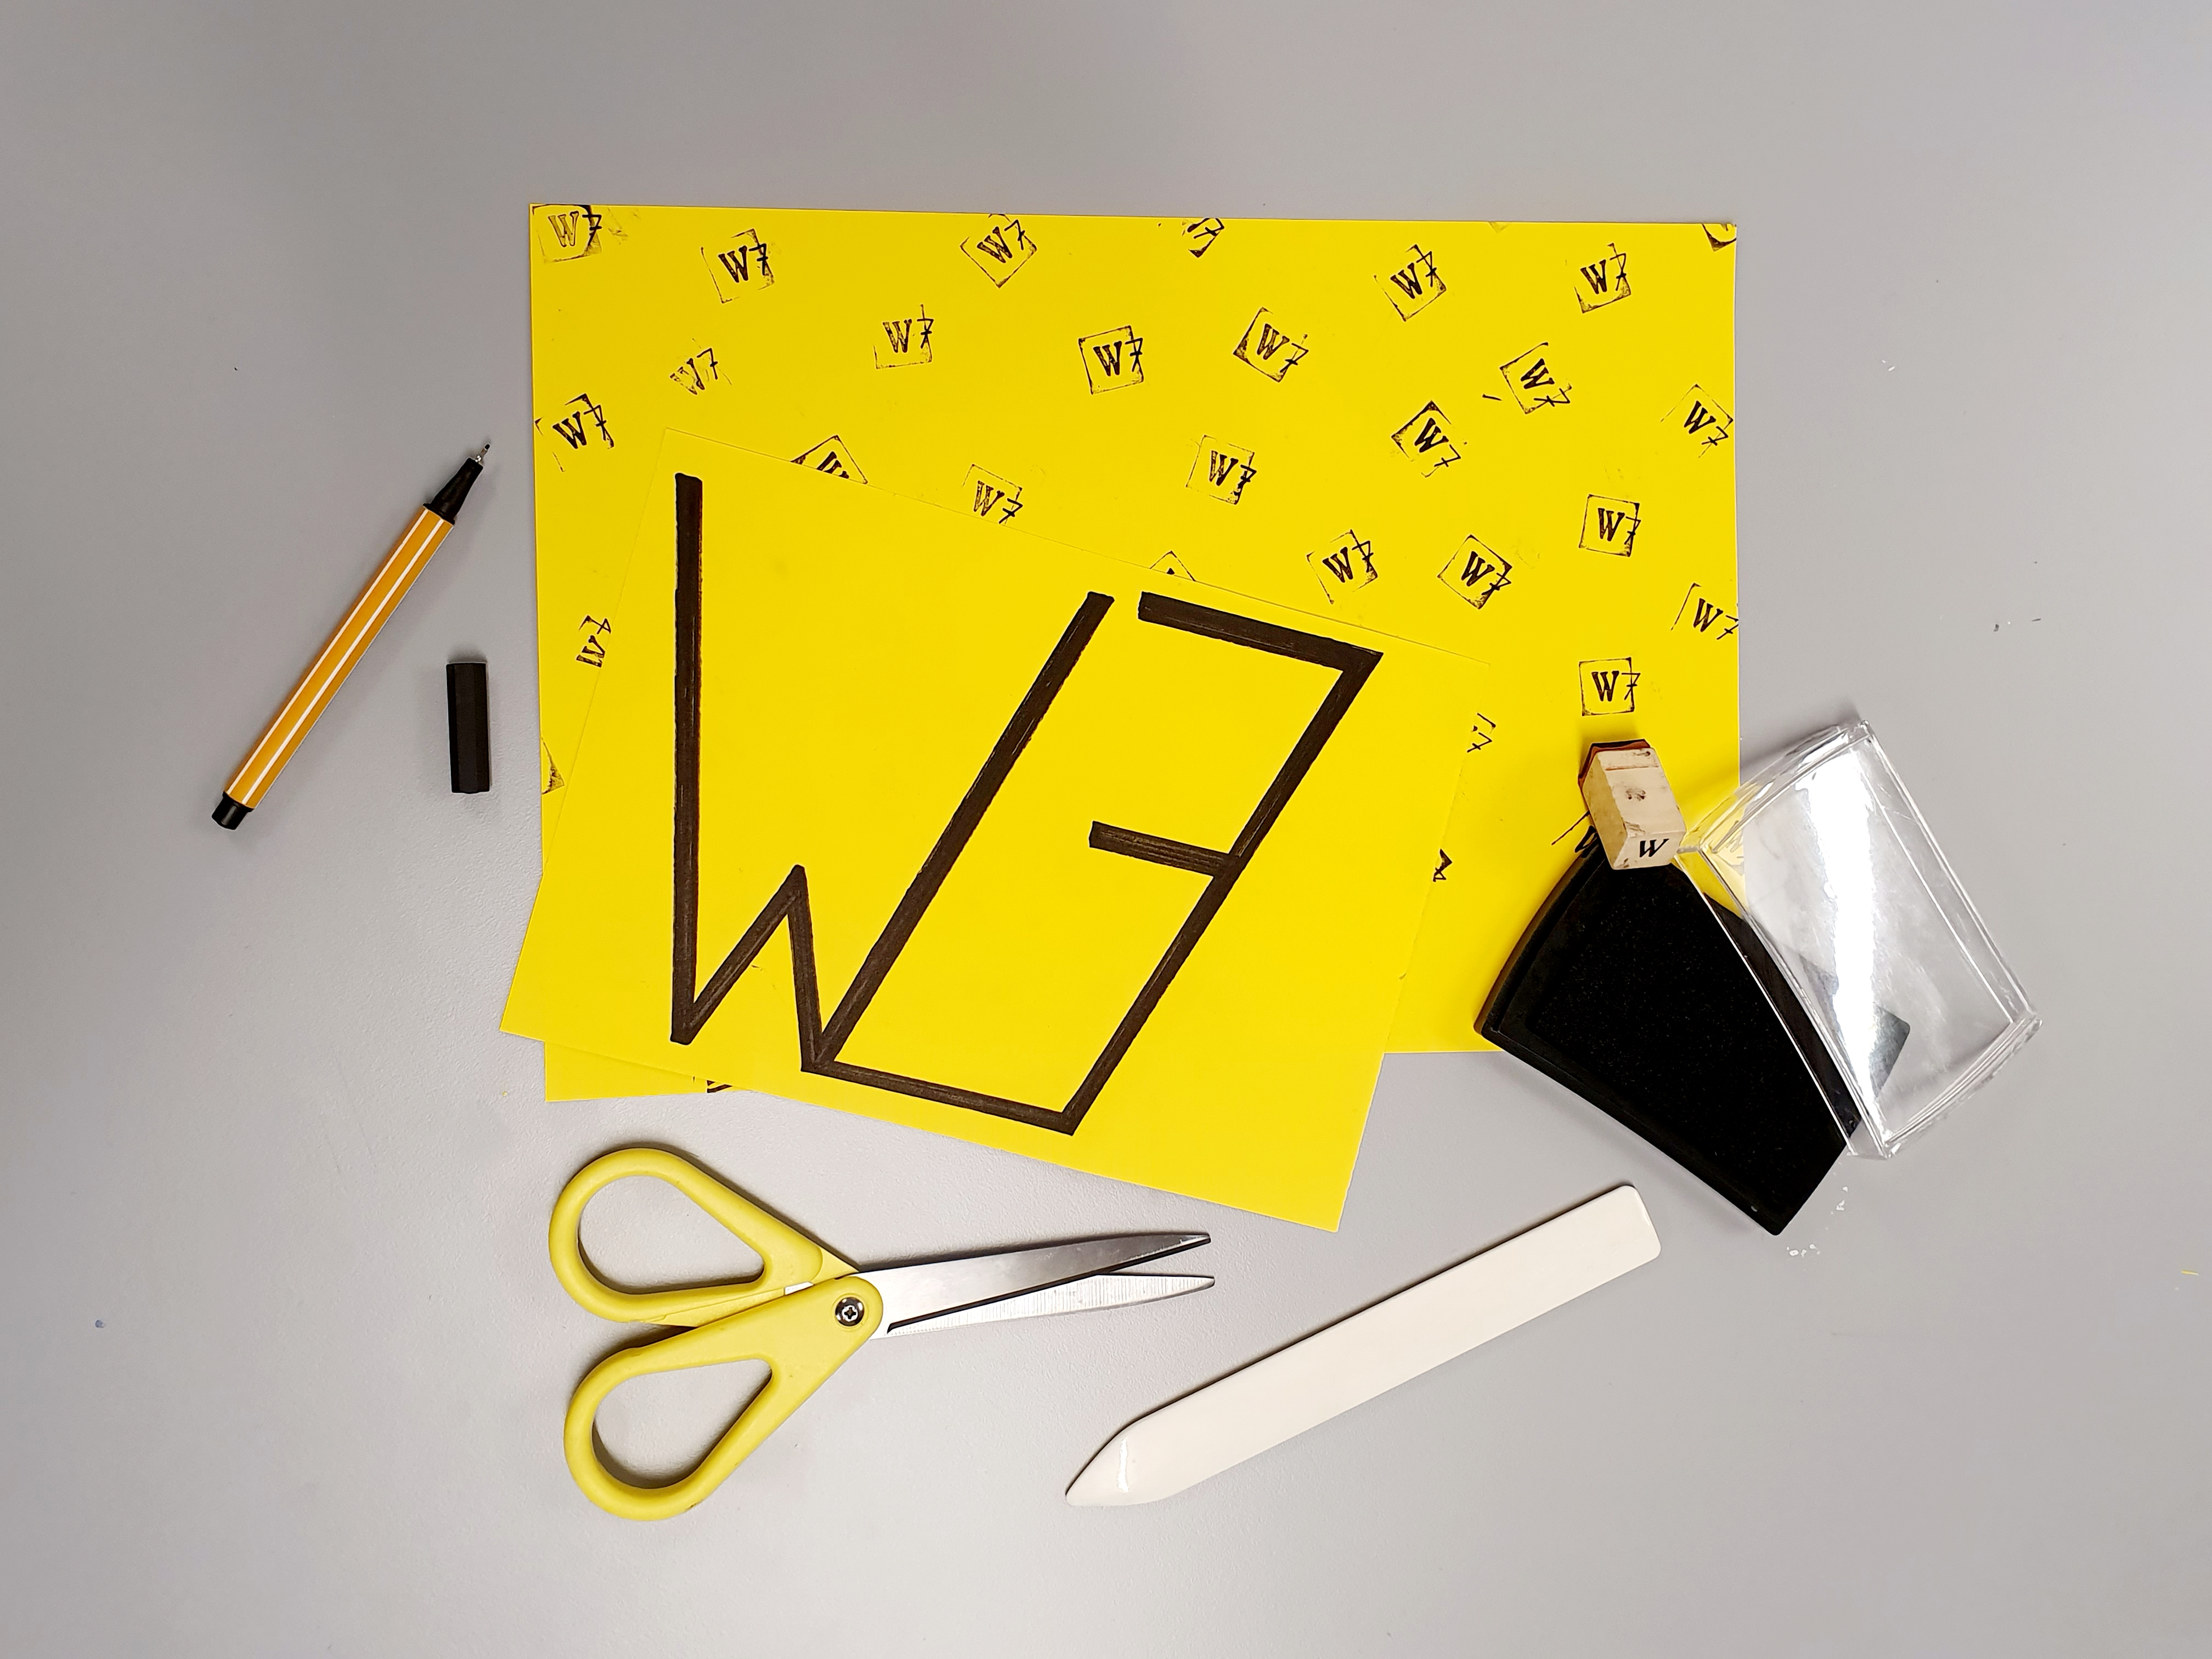 Vinjettbild W7